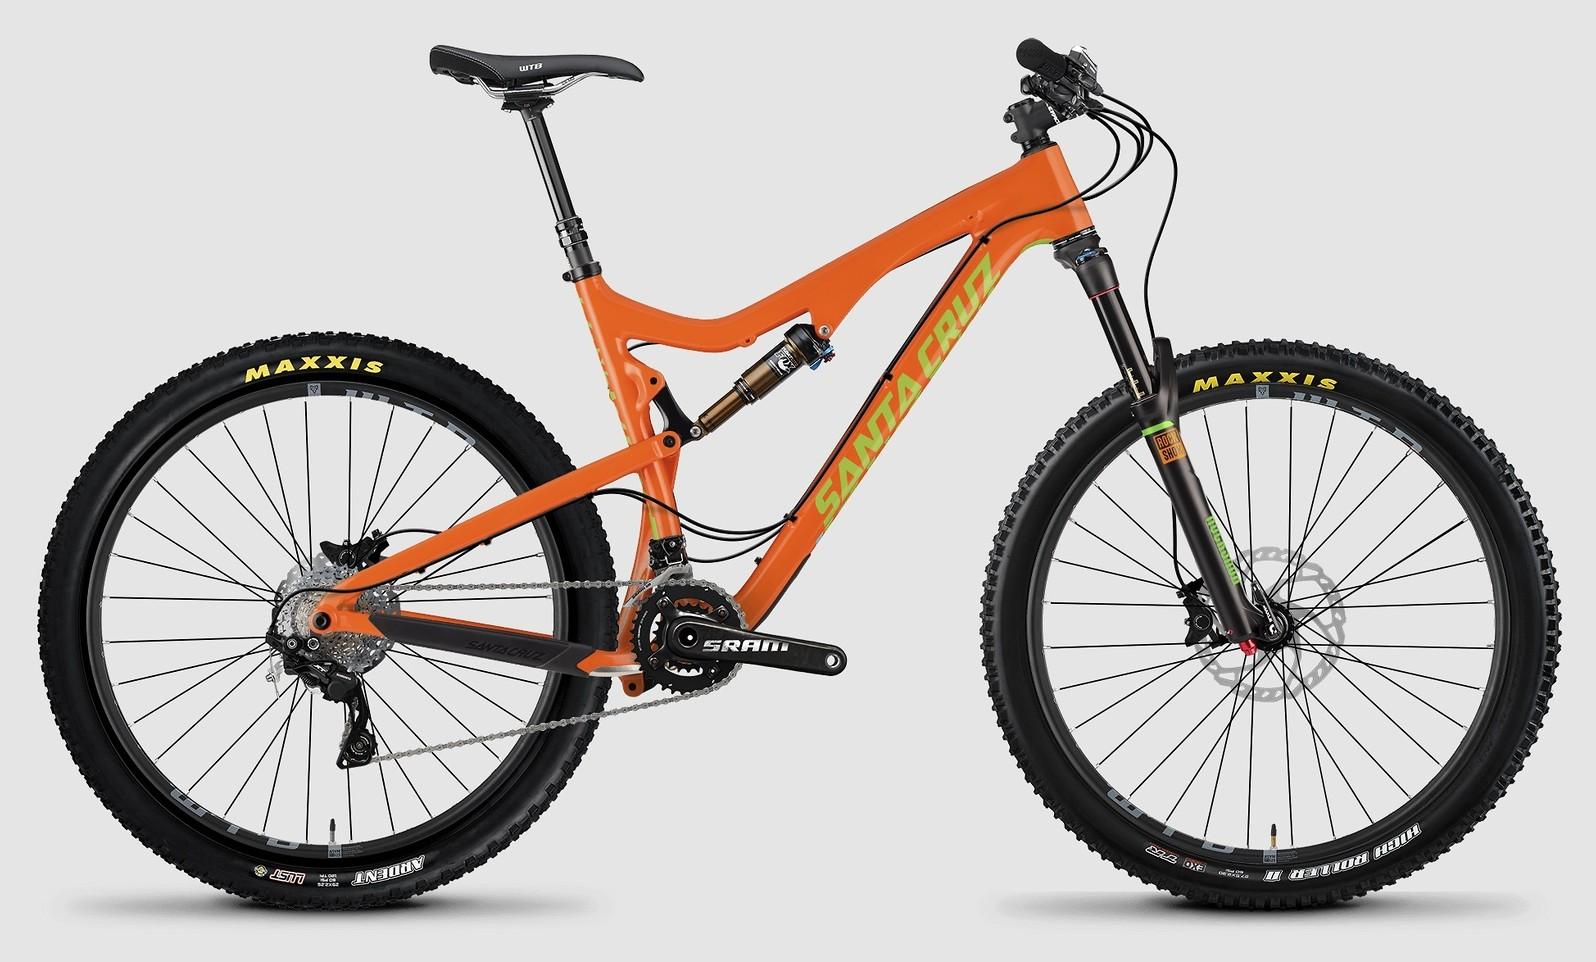 2015 Santa Cruz 5010 Carbon XT bike